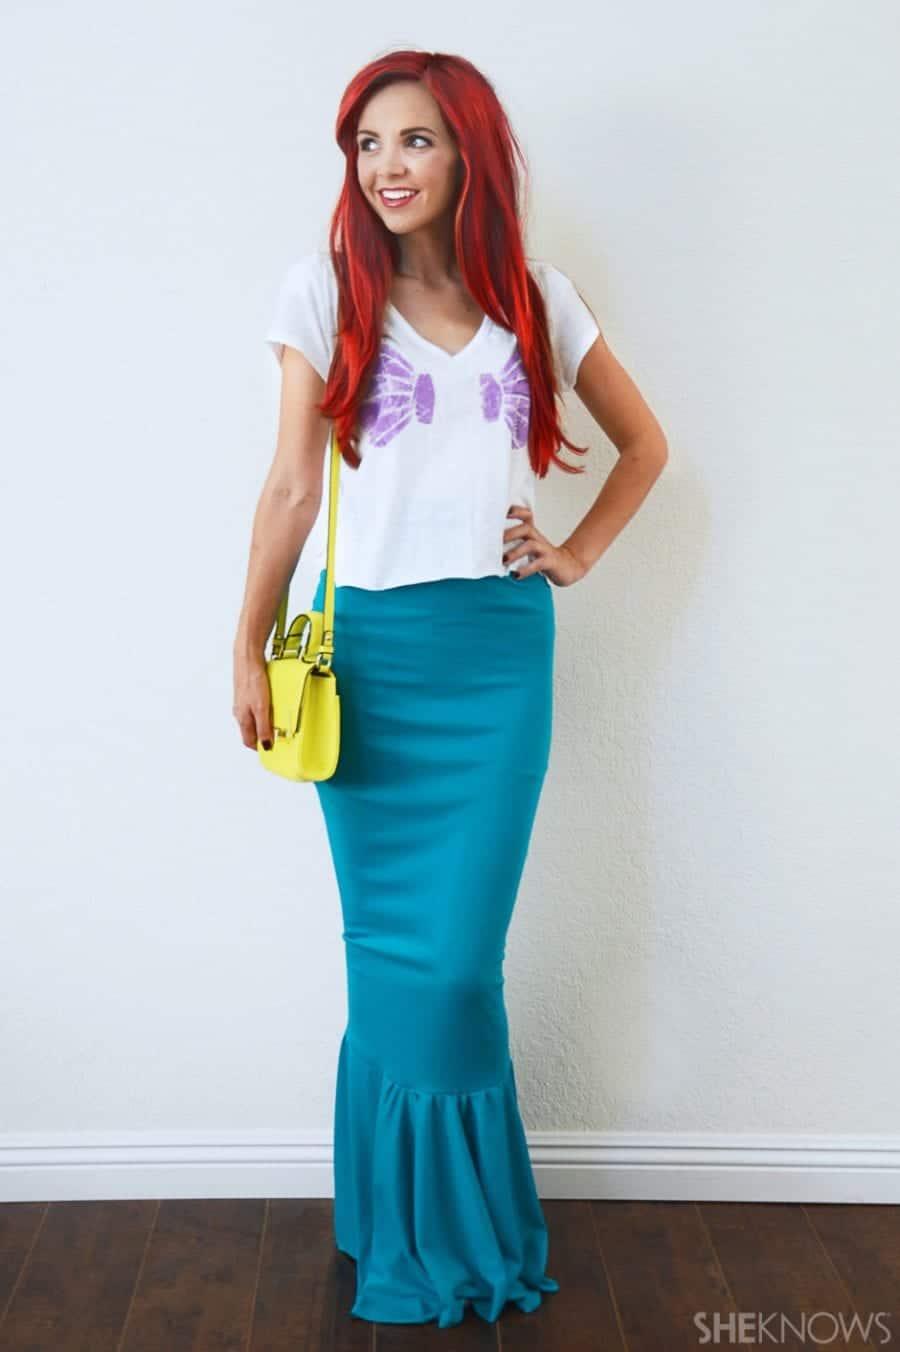 Ariel-Costume_eizfk6